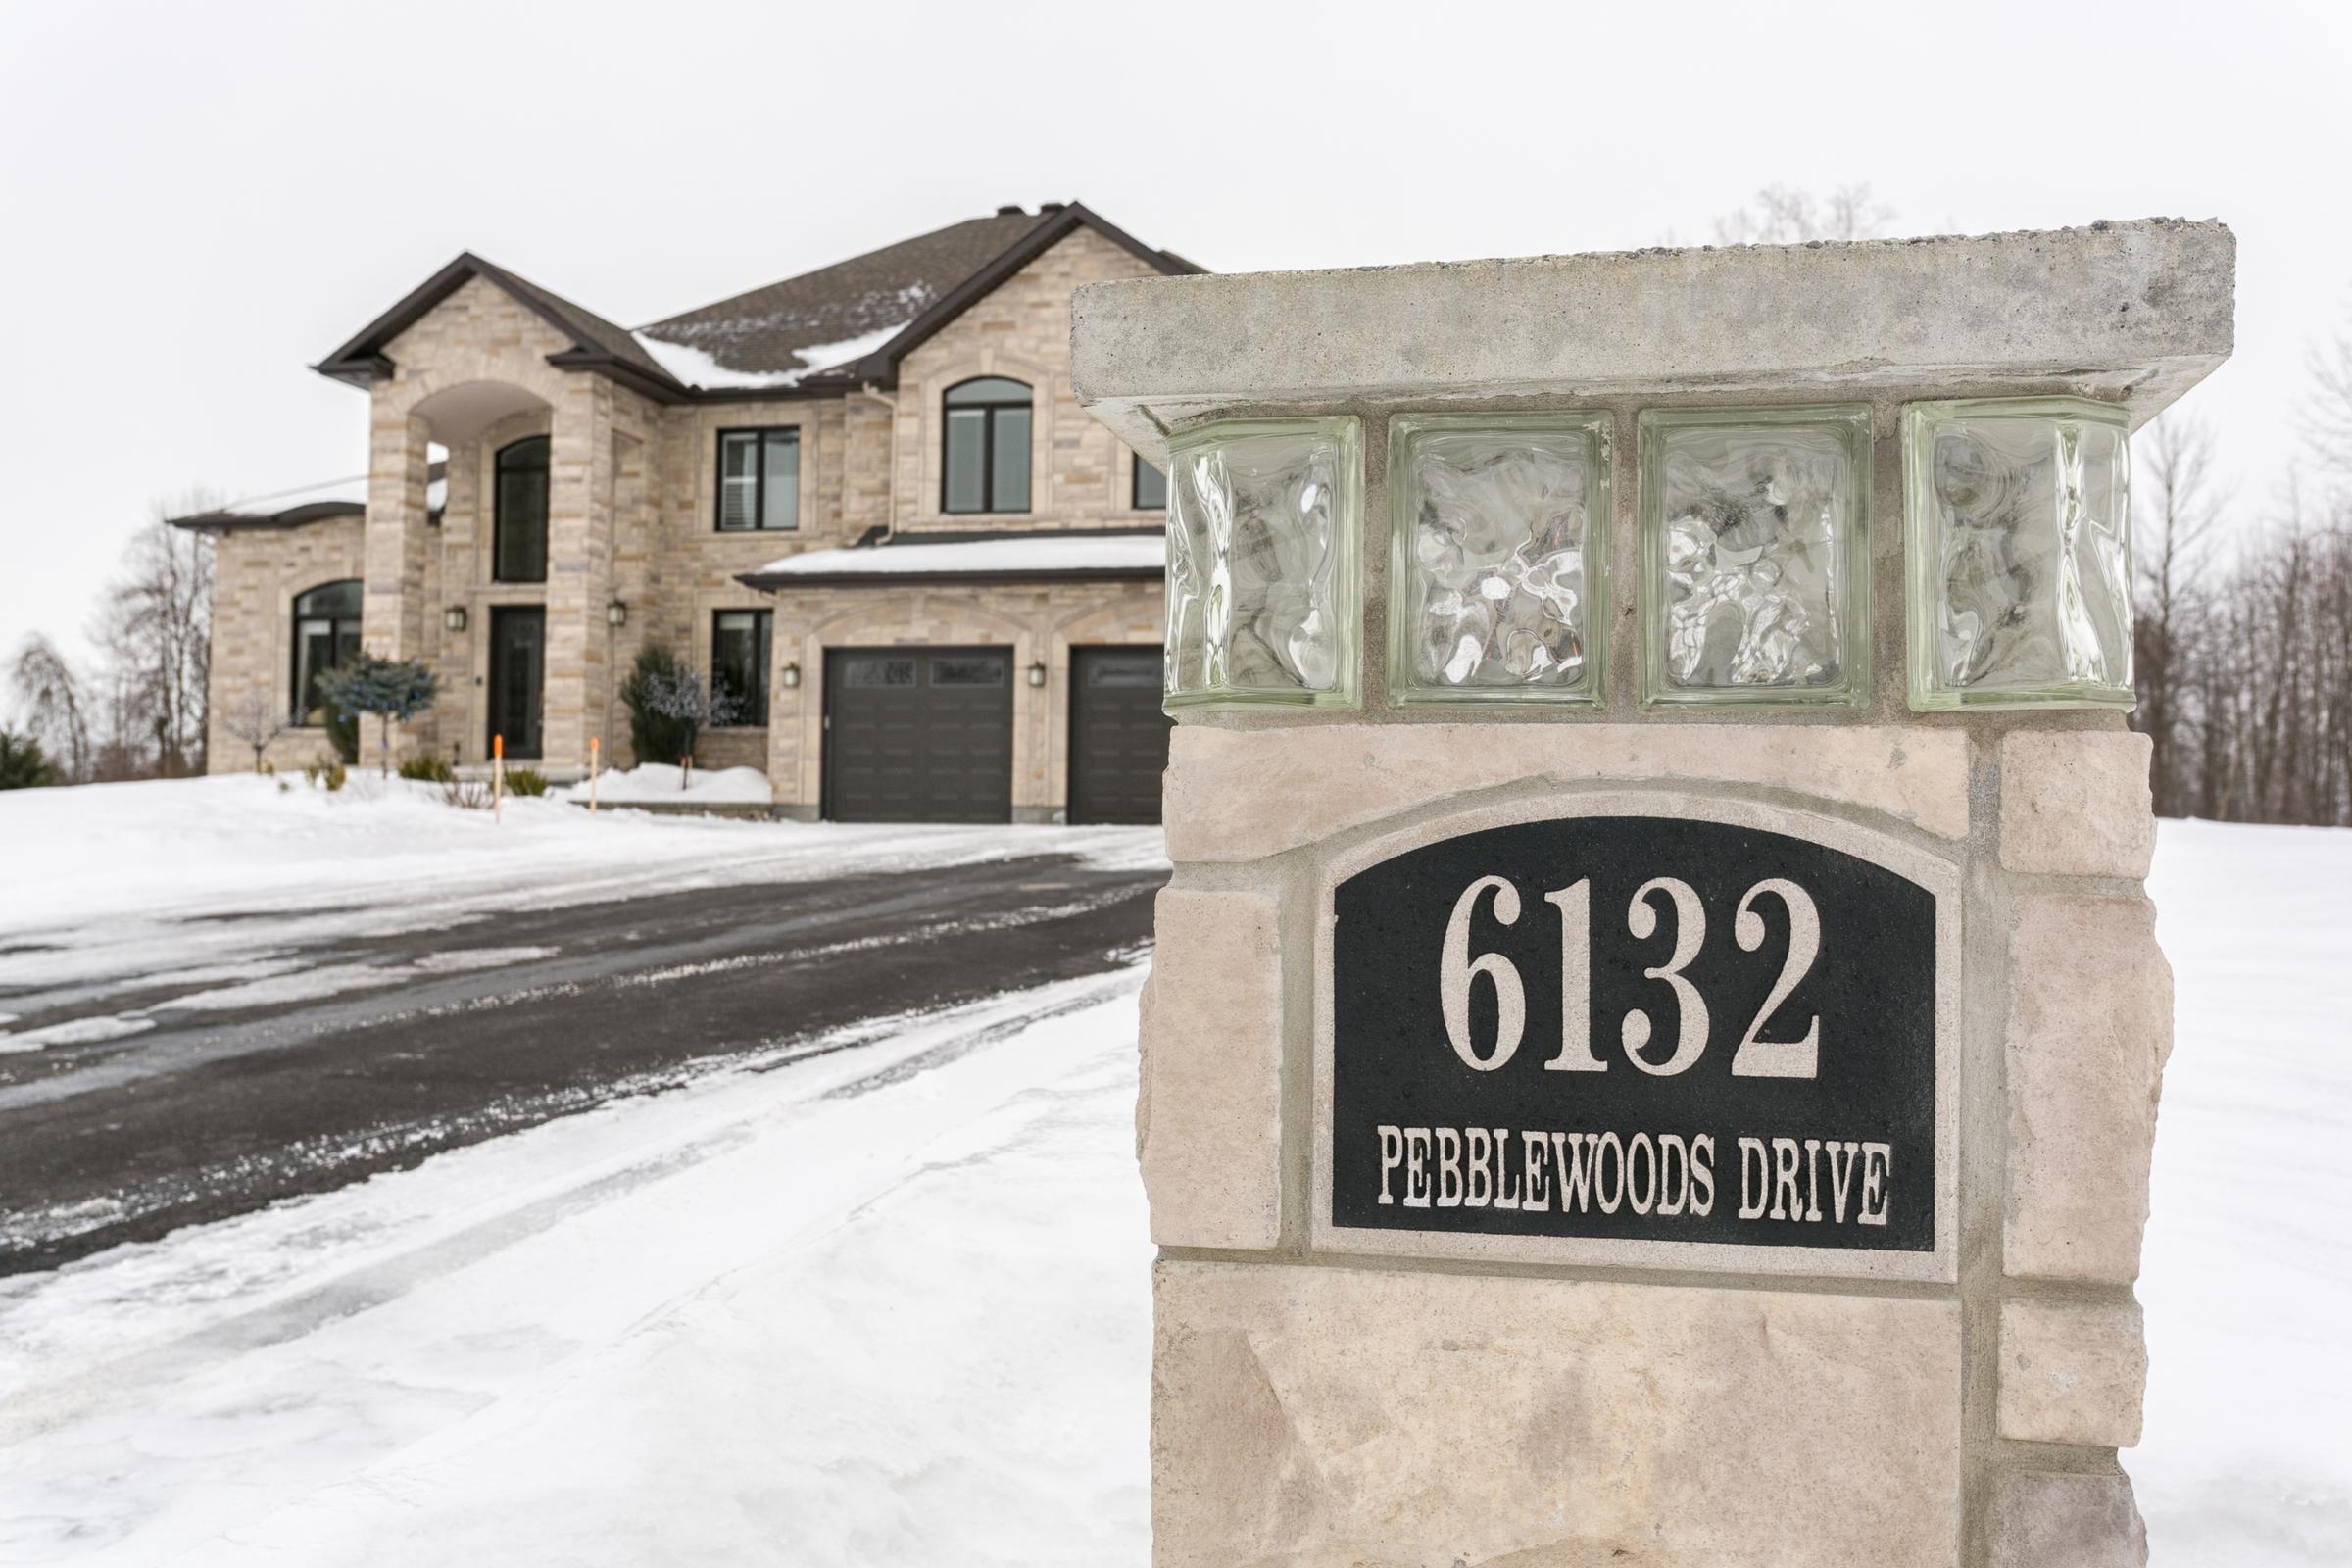 6132 Pebblewoods